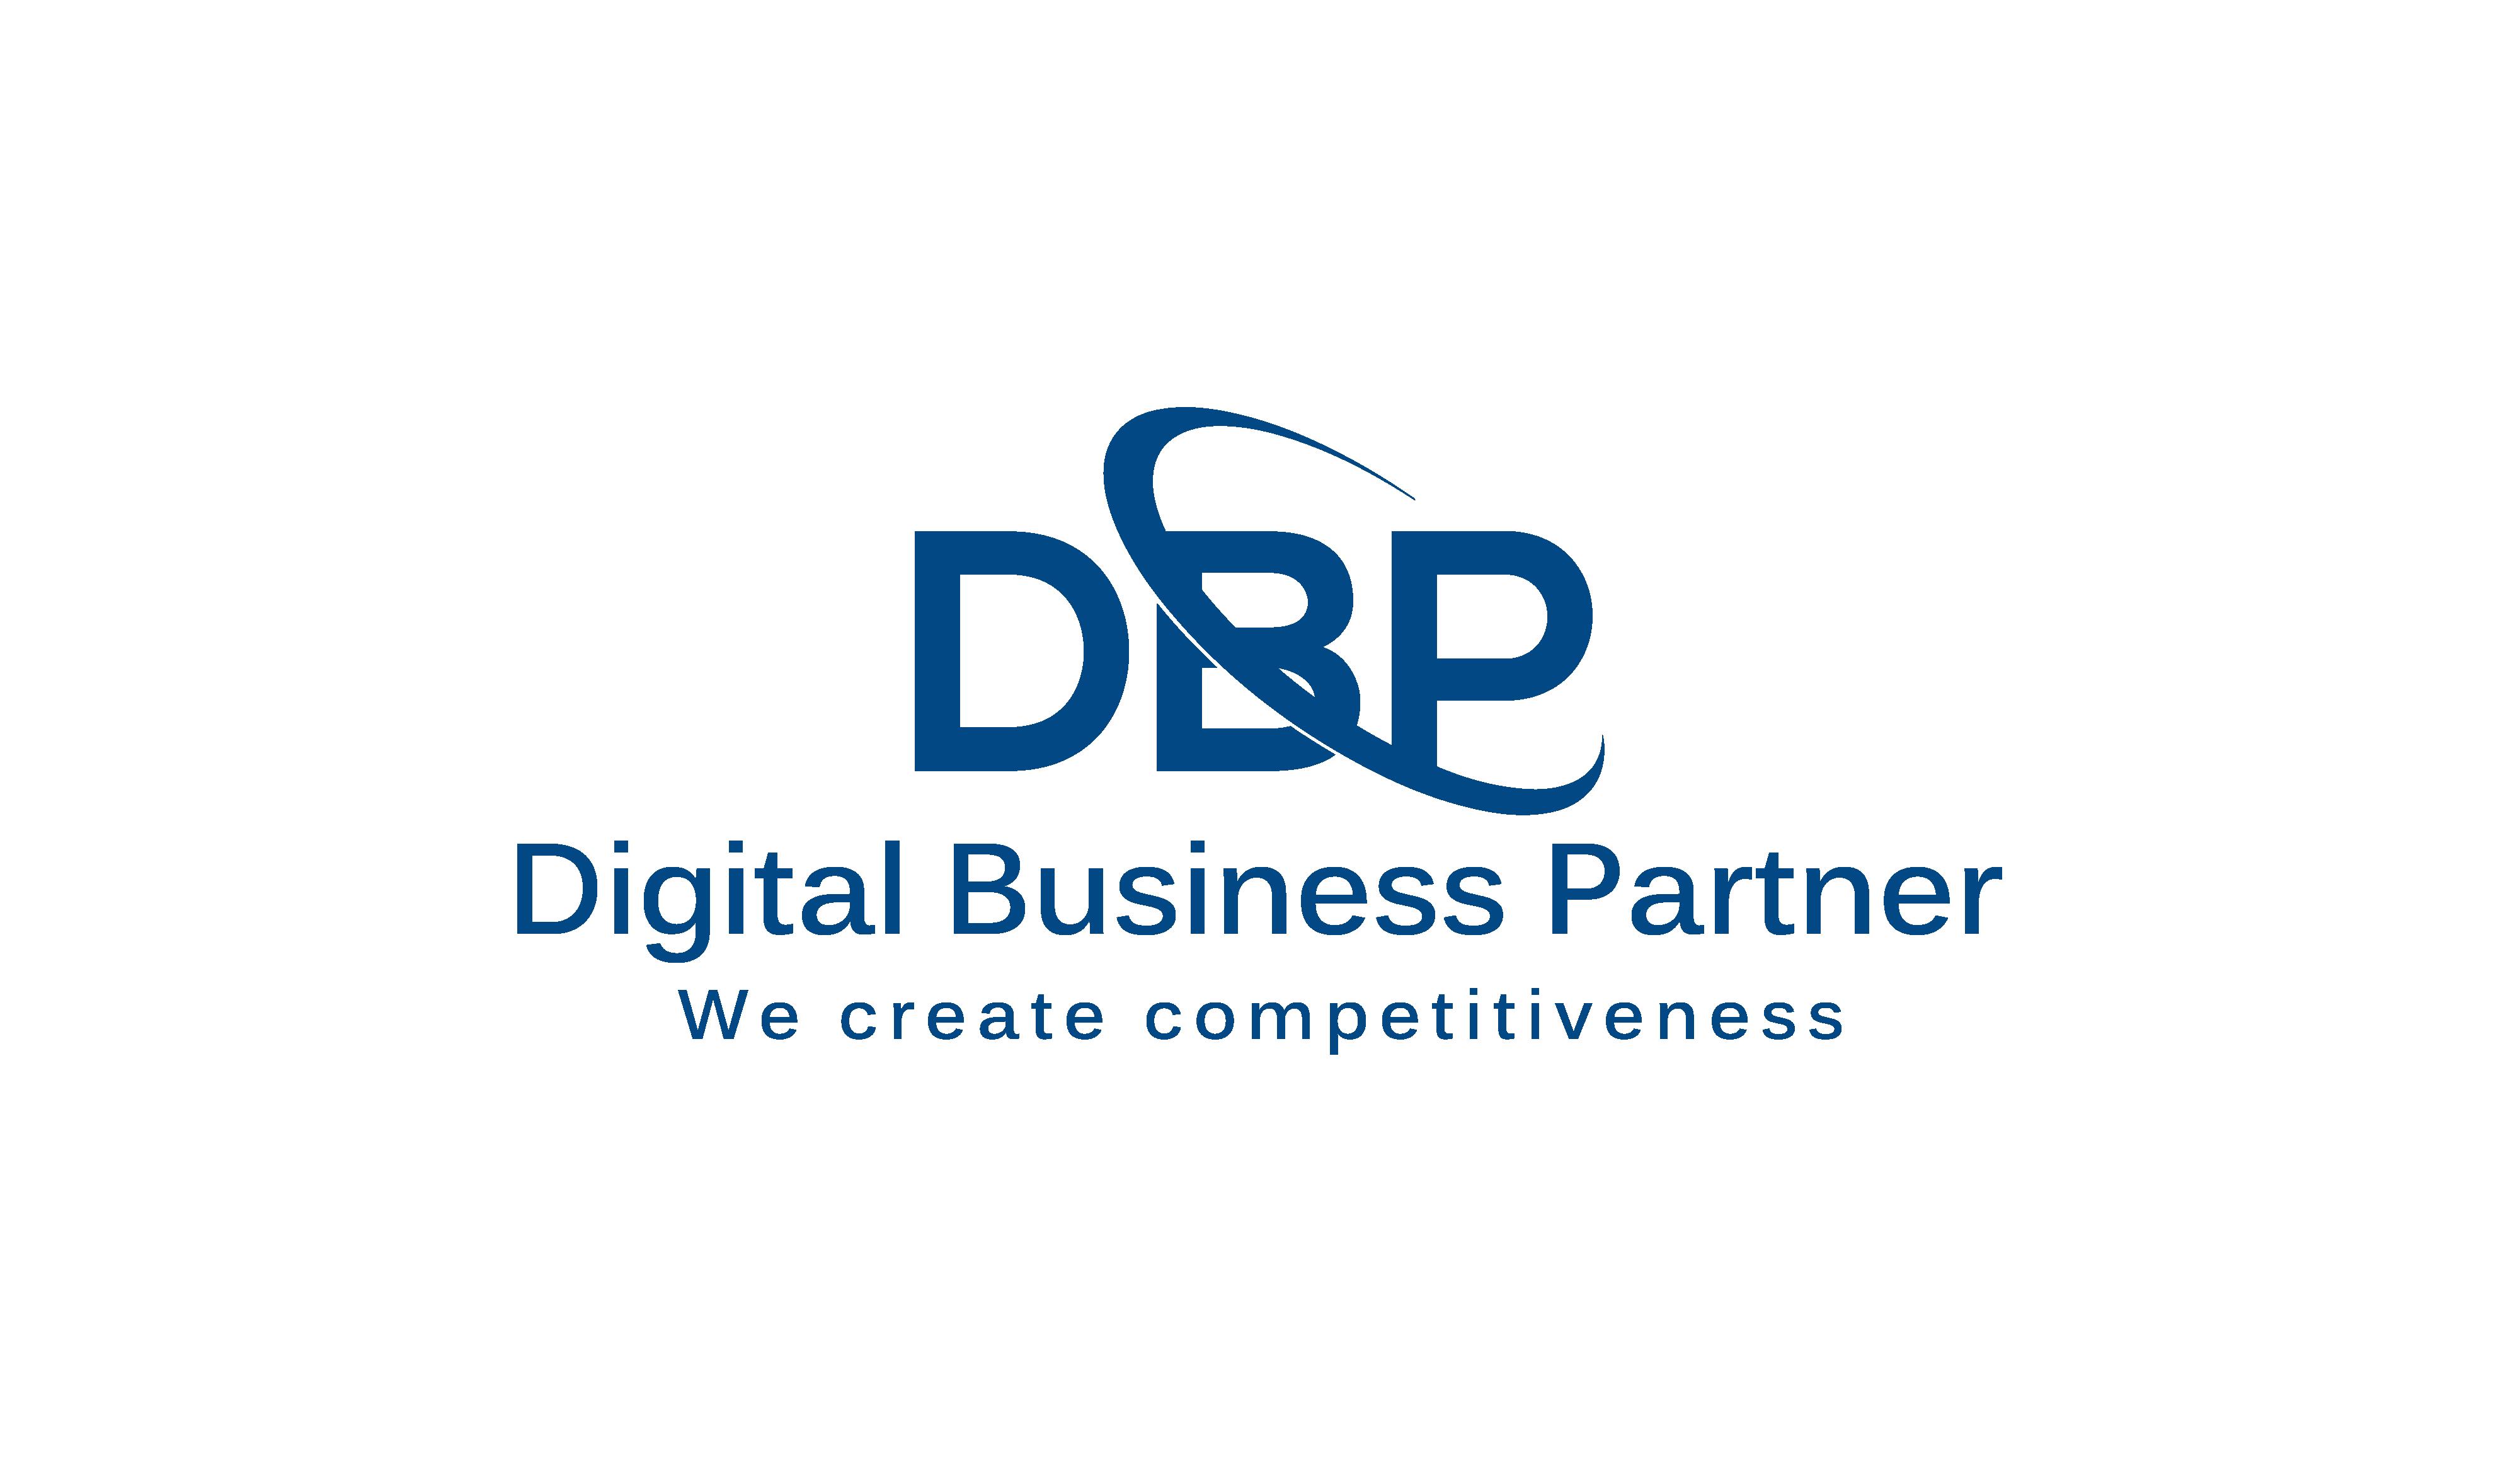 Digital Business Partner